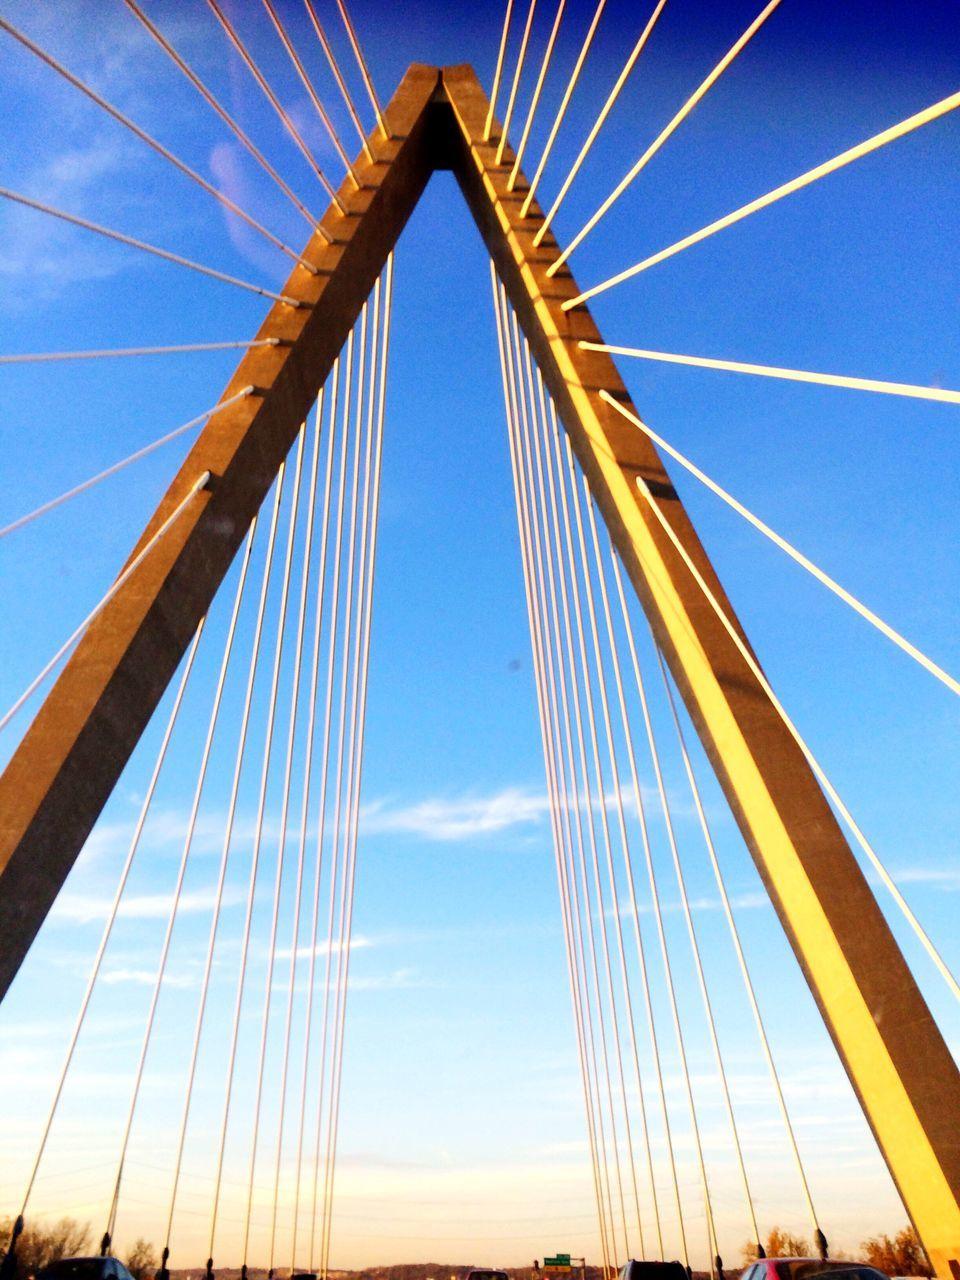 bridge - man made structure, suspension bridge, connection, engineering, built structure, architecture, low angle view, transportation, sky, no people, blue, day, outdoors, bridge, travel, travel destinations, line, chain bridge